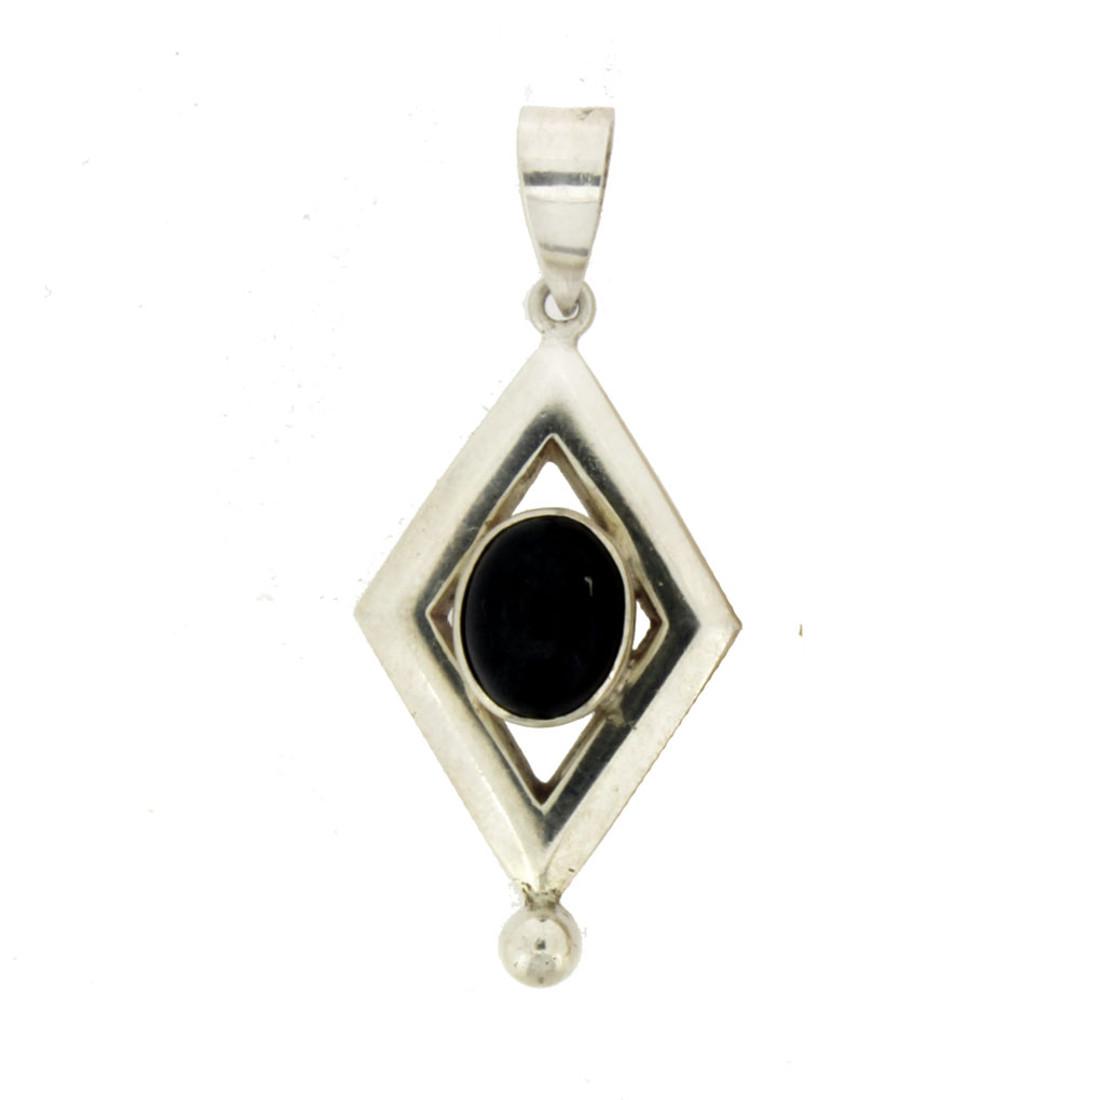 Oval Cabochon Stone Black Onyx Sterling Silver Pendant